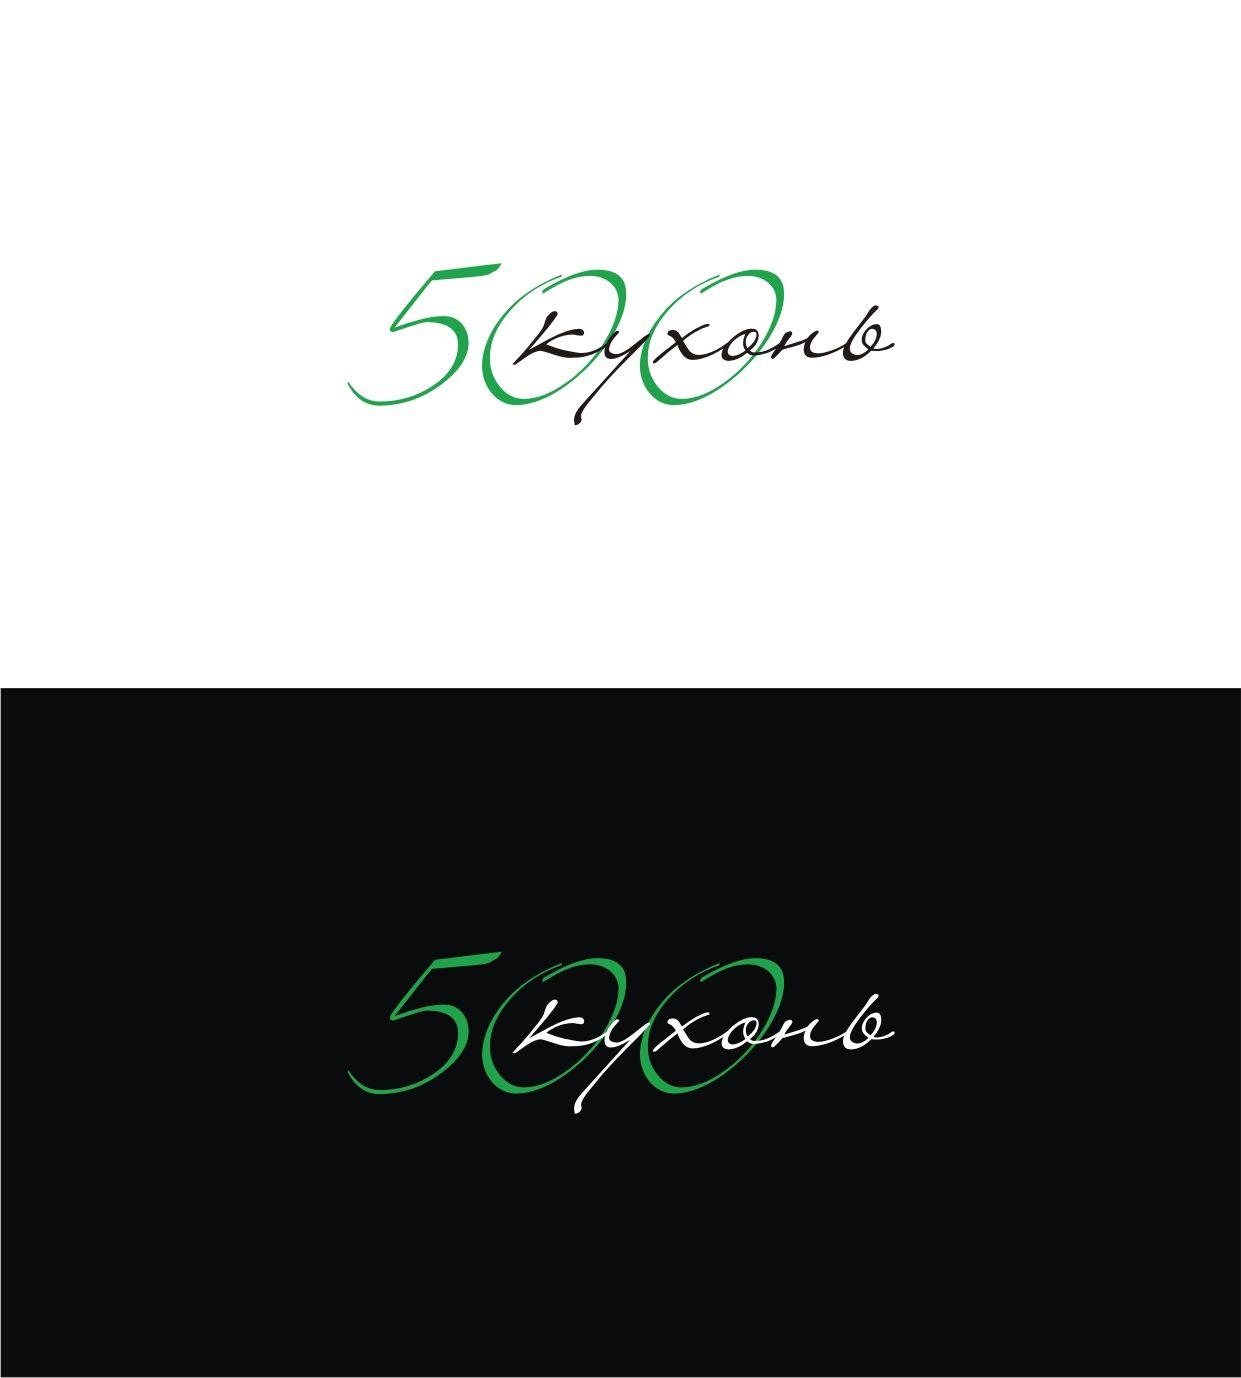 Логотип для интернет каталога кухонь - дизайнер LiXoOnshade